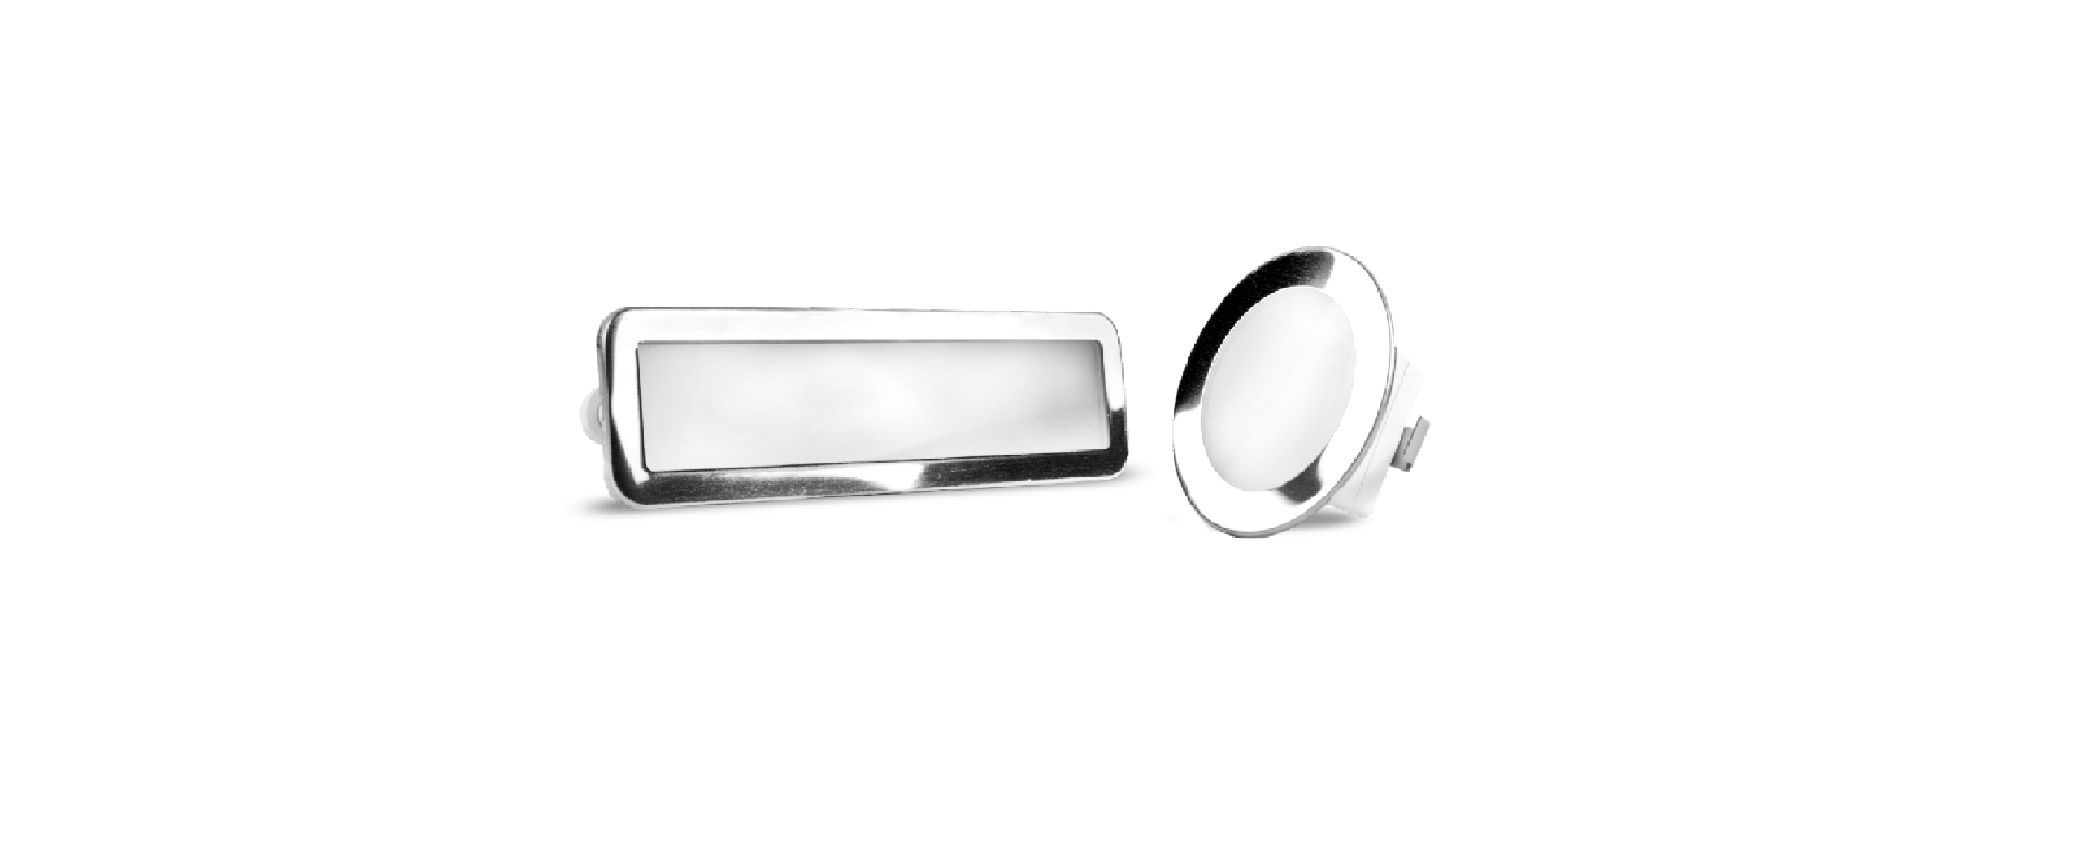 لامپ های لوازم خانگی خانگی (یخچال،هود و خودرویی) صنایع روشنایی الماس لایت